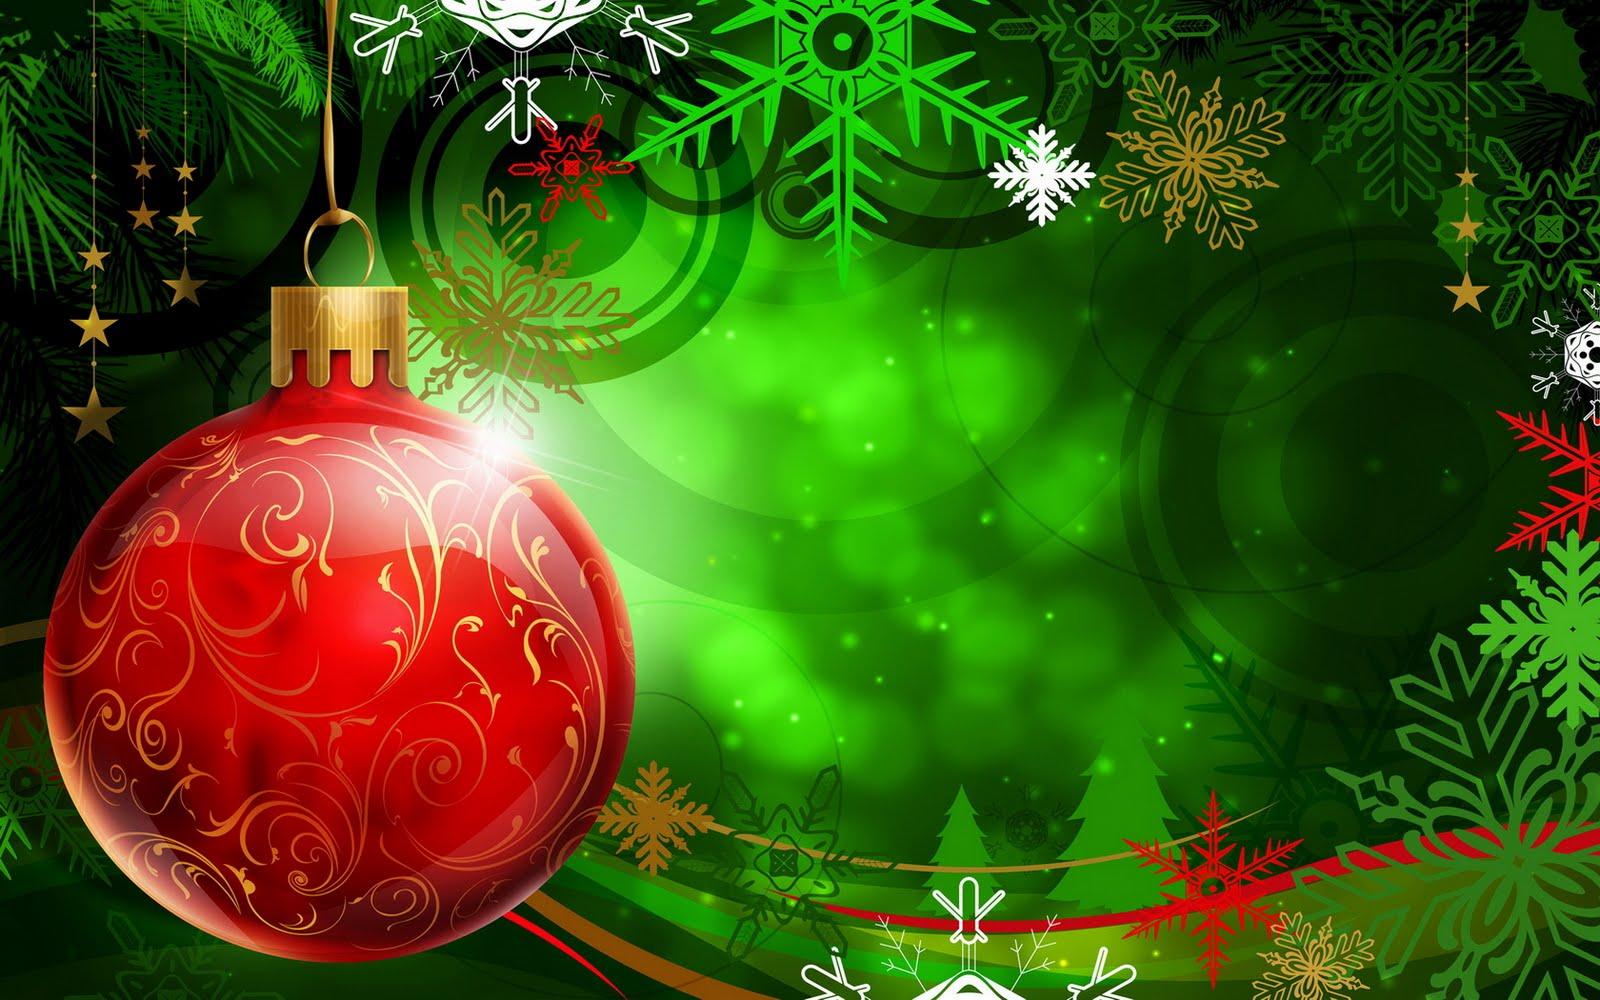 Christmas Wallpapers X mas Backgrounds  Animated Screensavers Xmas 1600x1000